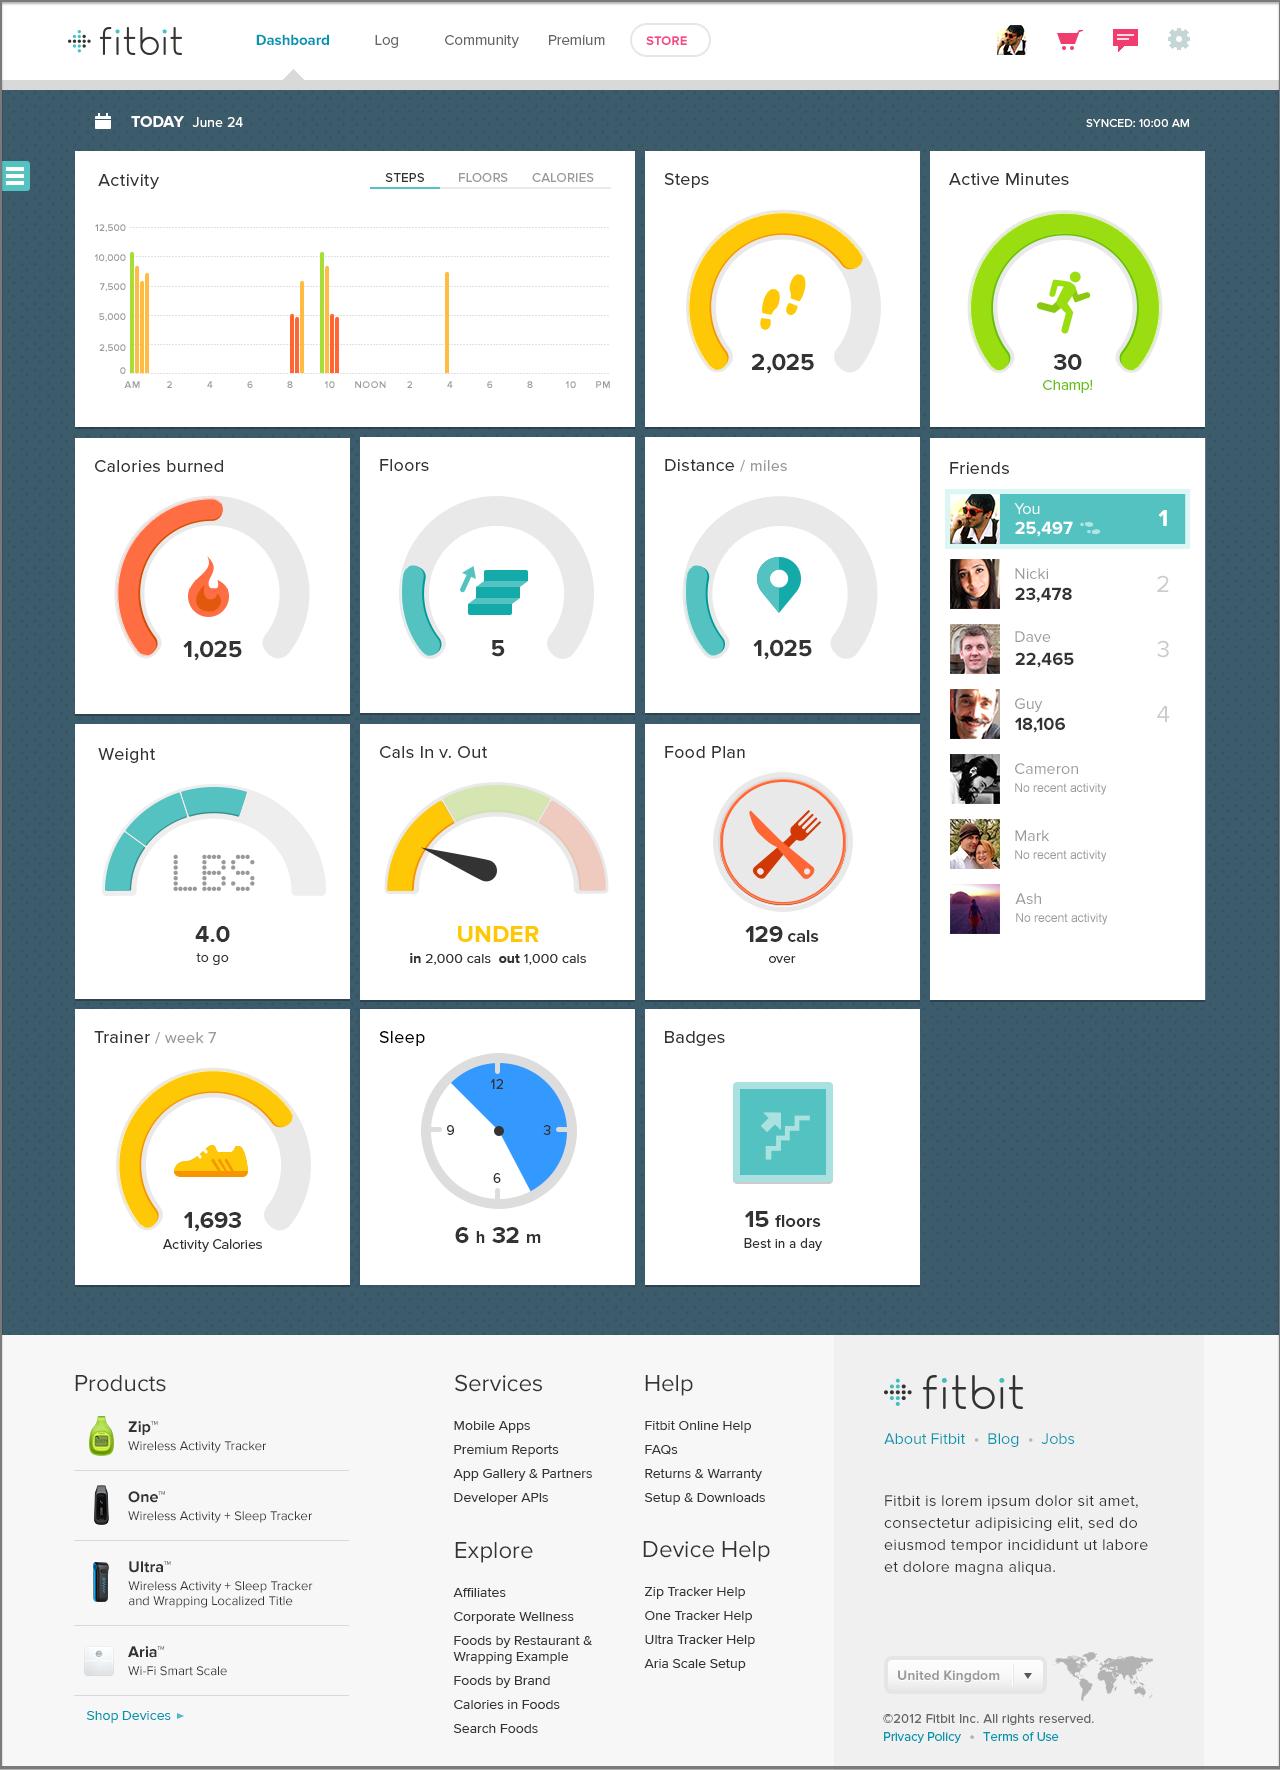 Beta Dashboard (2013-present)